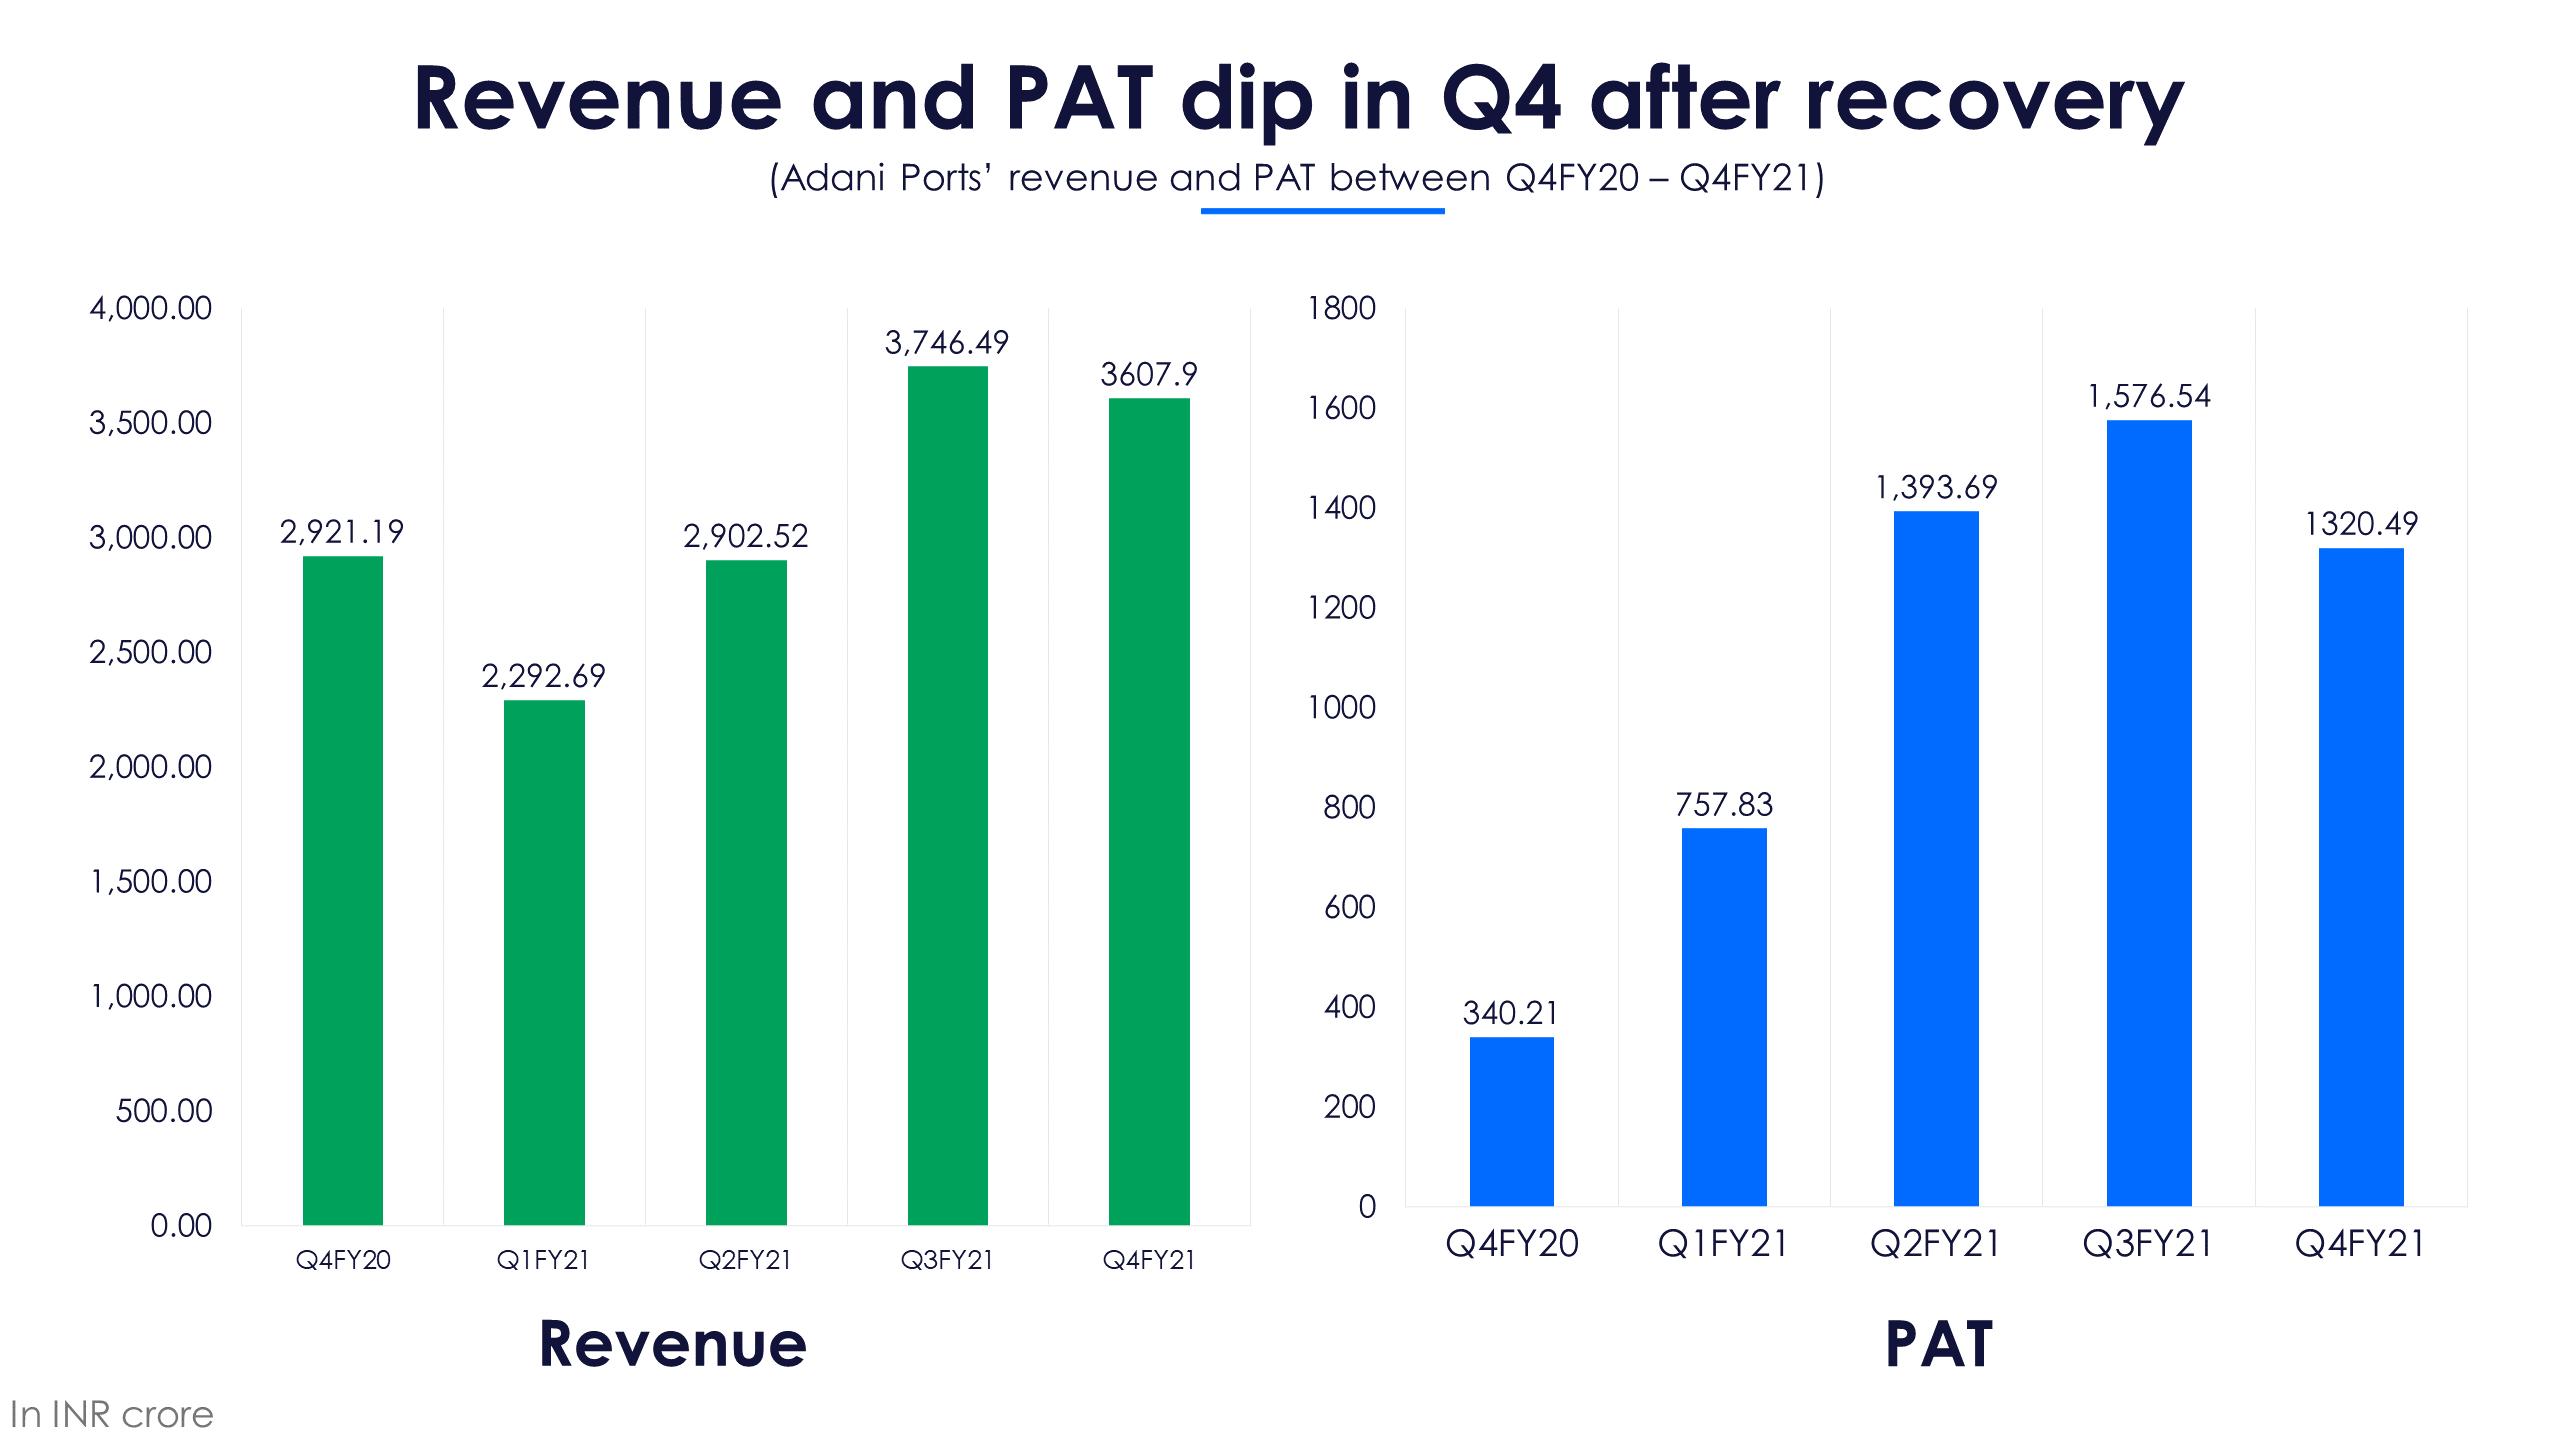 Adani Ports Revenue and PAT